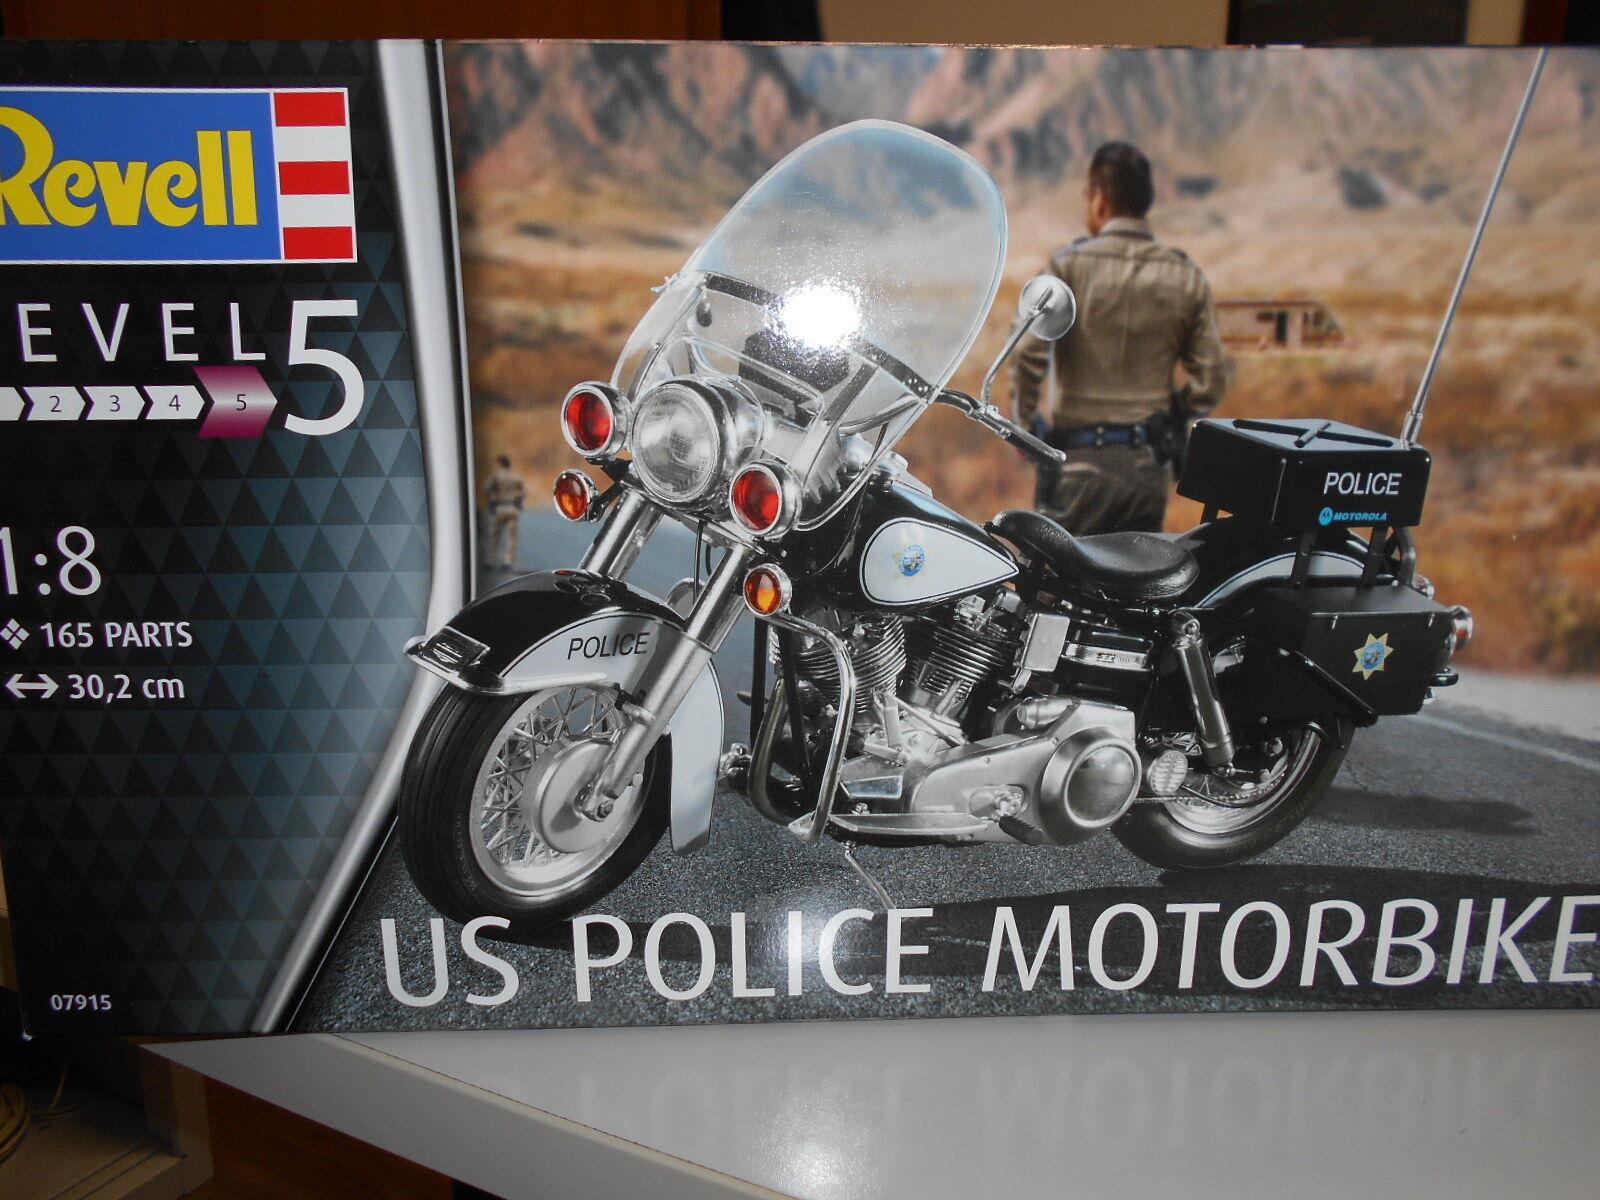 REV07915 by REVELL US POLICE MOTORBIKE - KIT DI MONTAGGIO - 1 8